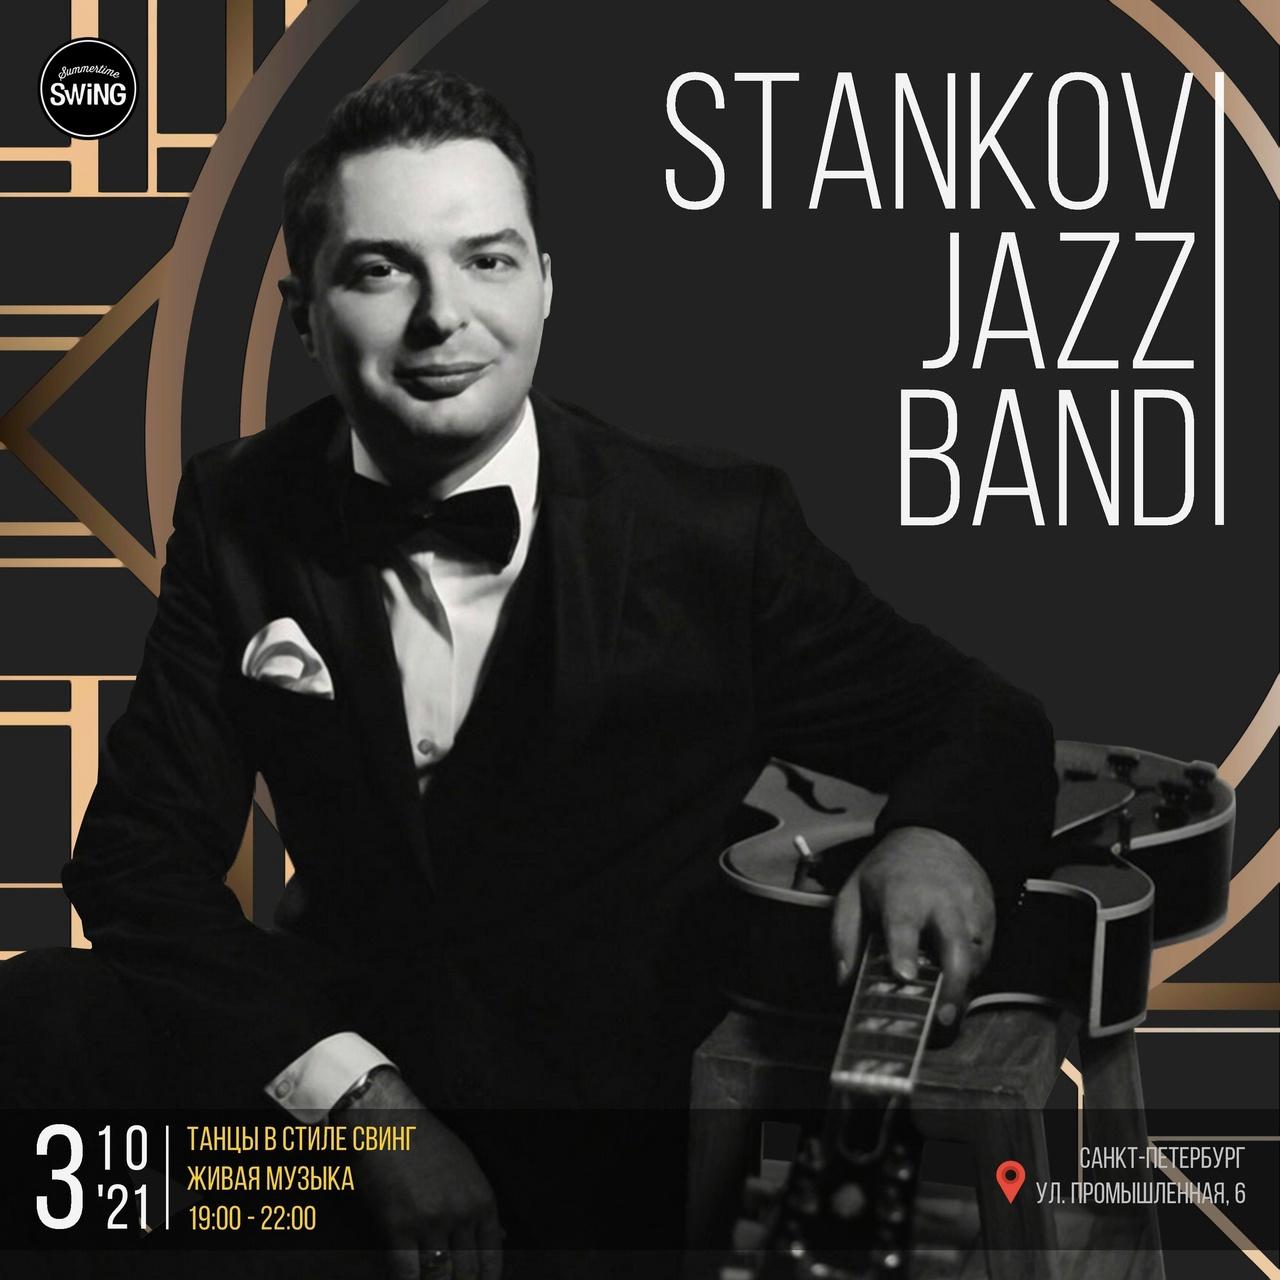 03.10 Stankov Jazz Band в клубе Summertime Swing!